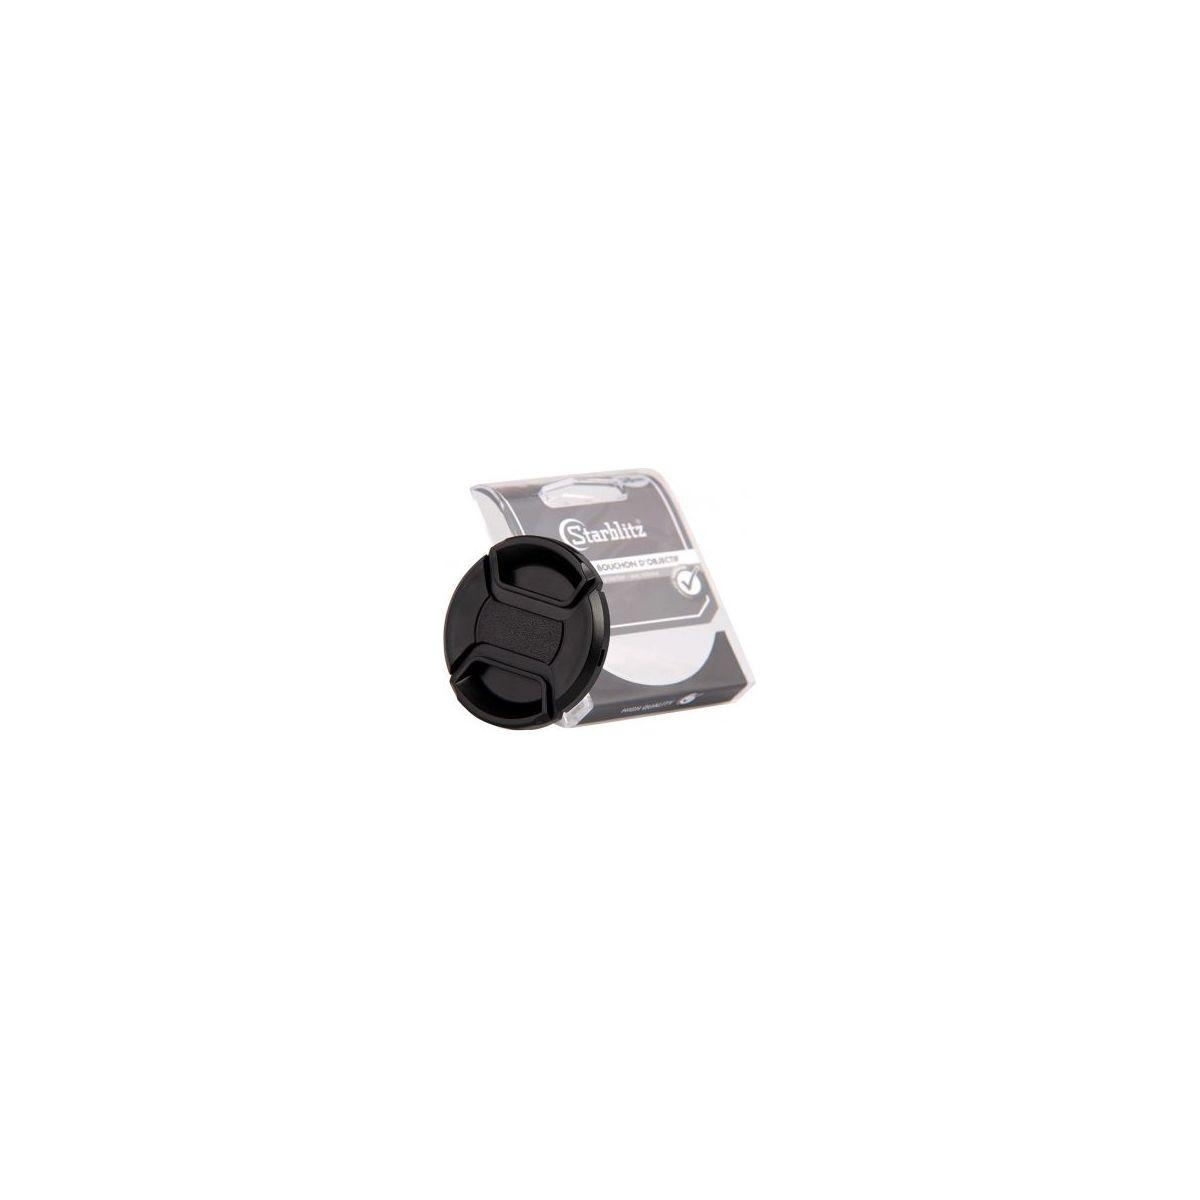 Bouchon d'objectif starblitz d'objectif 49mm (photo)